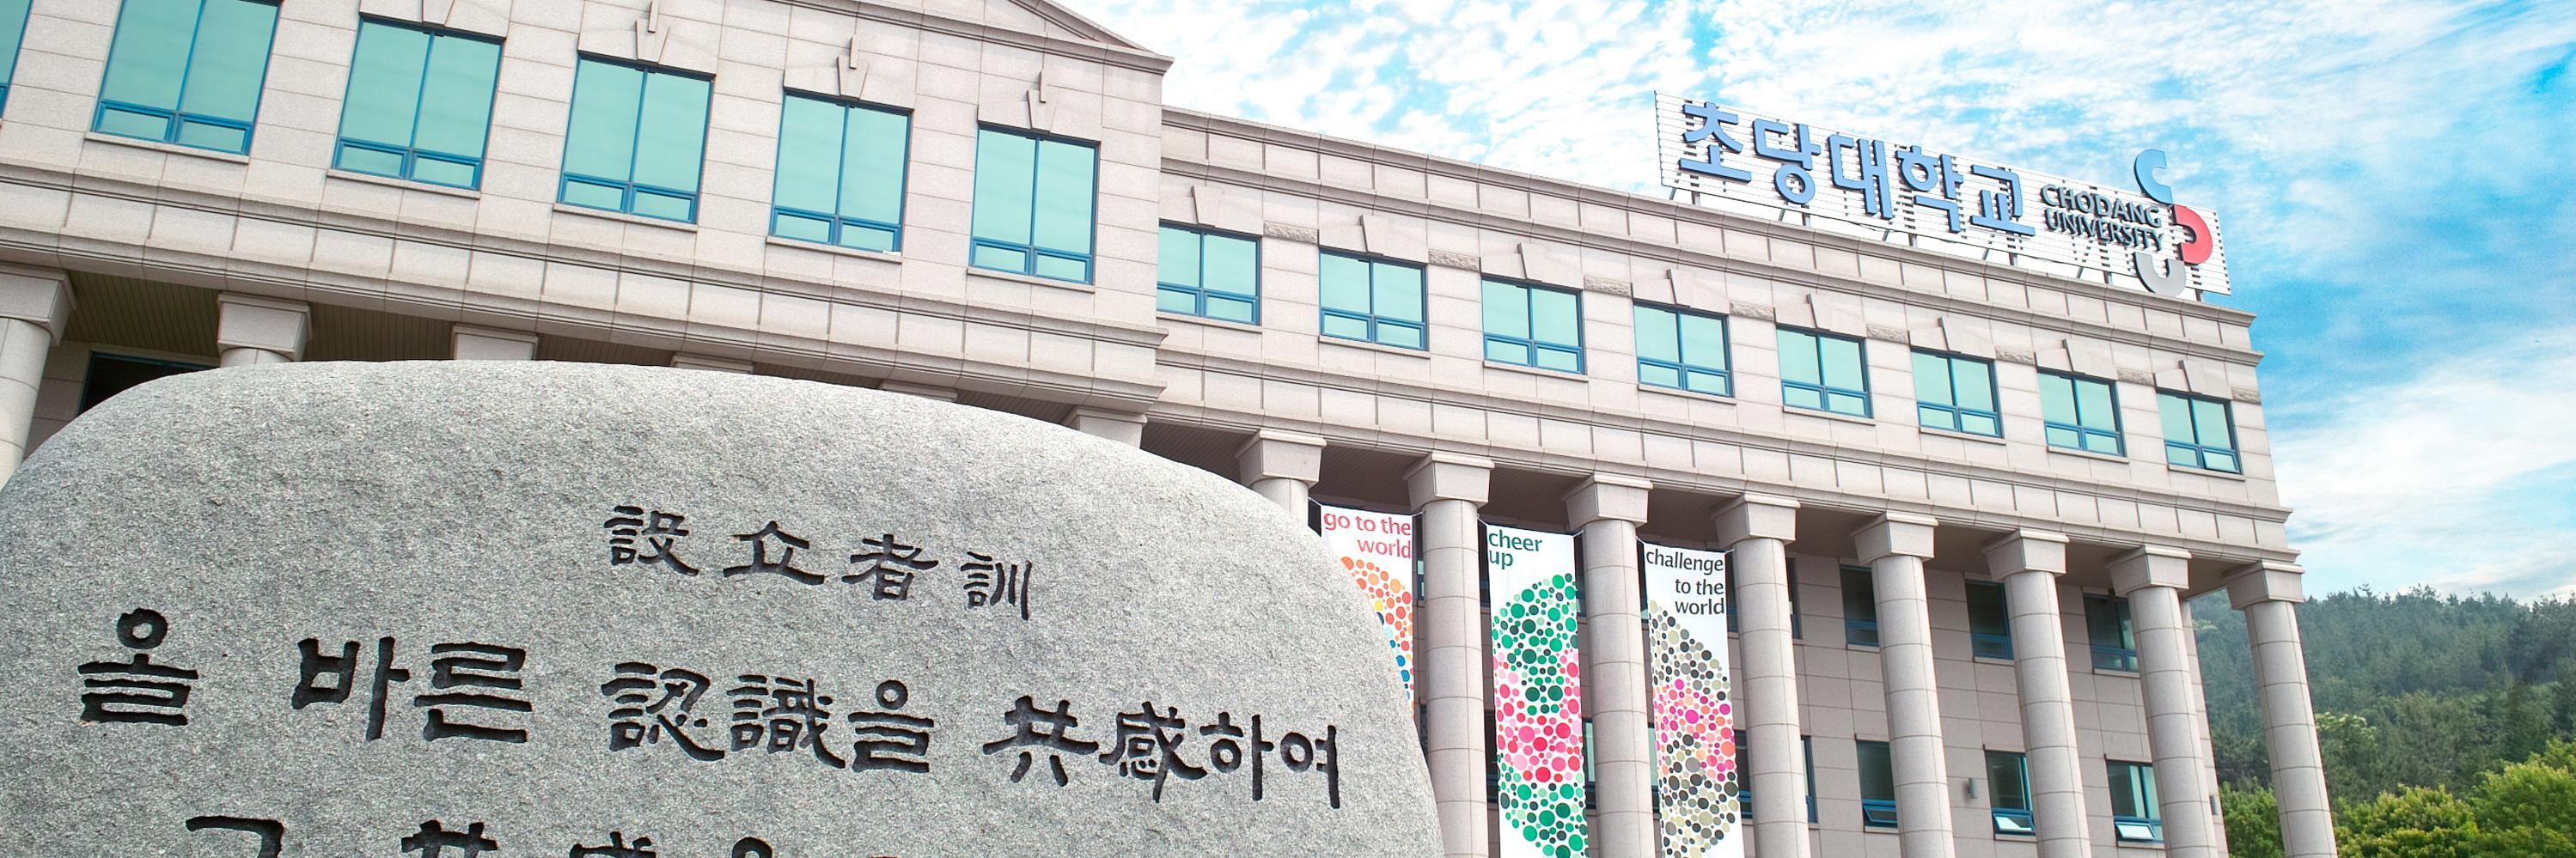 Chodang University's official Twitter account